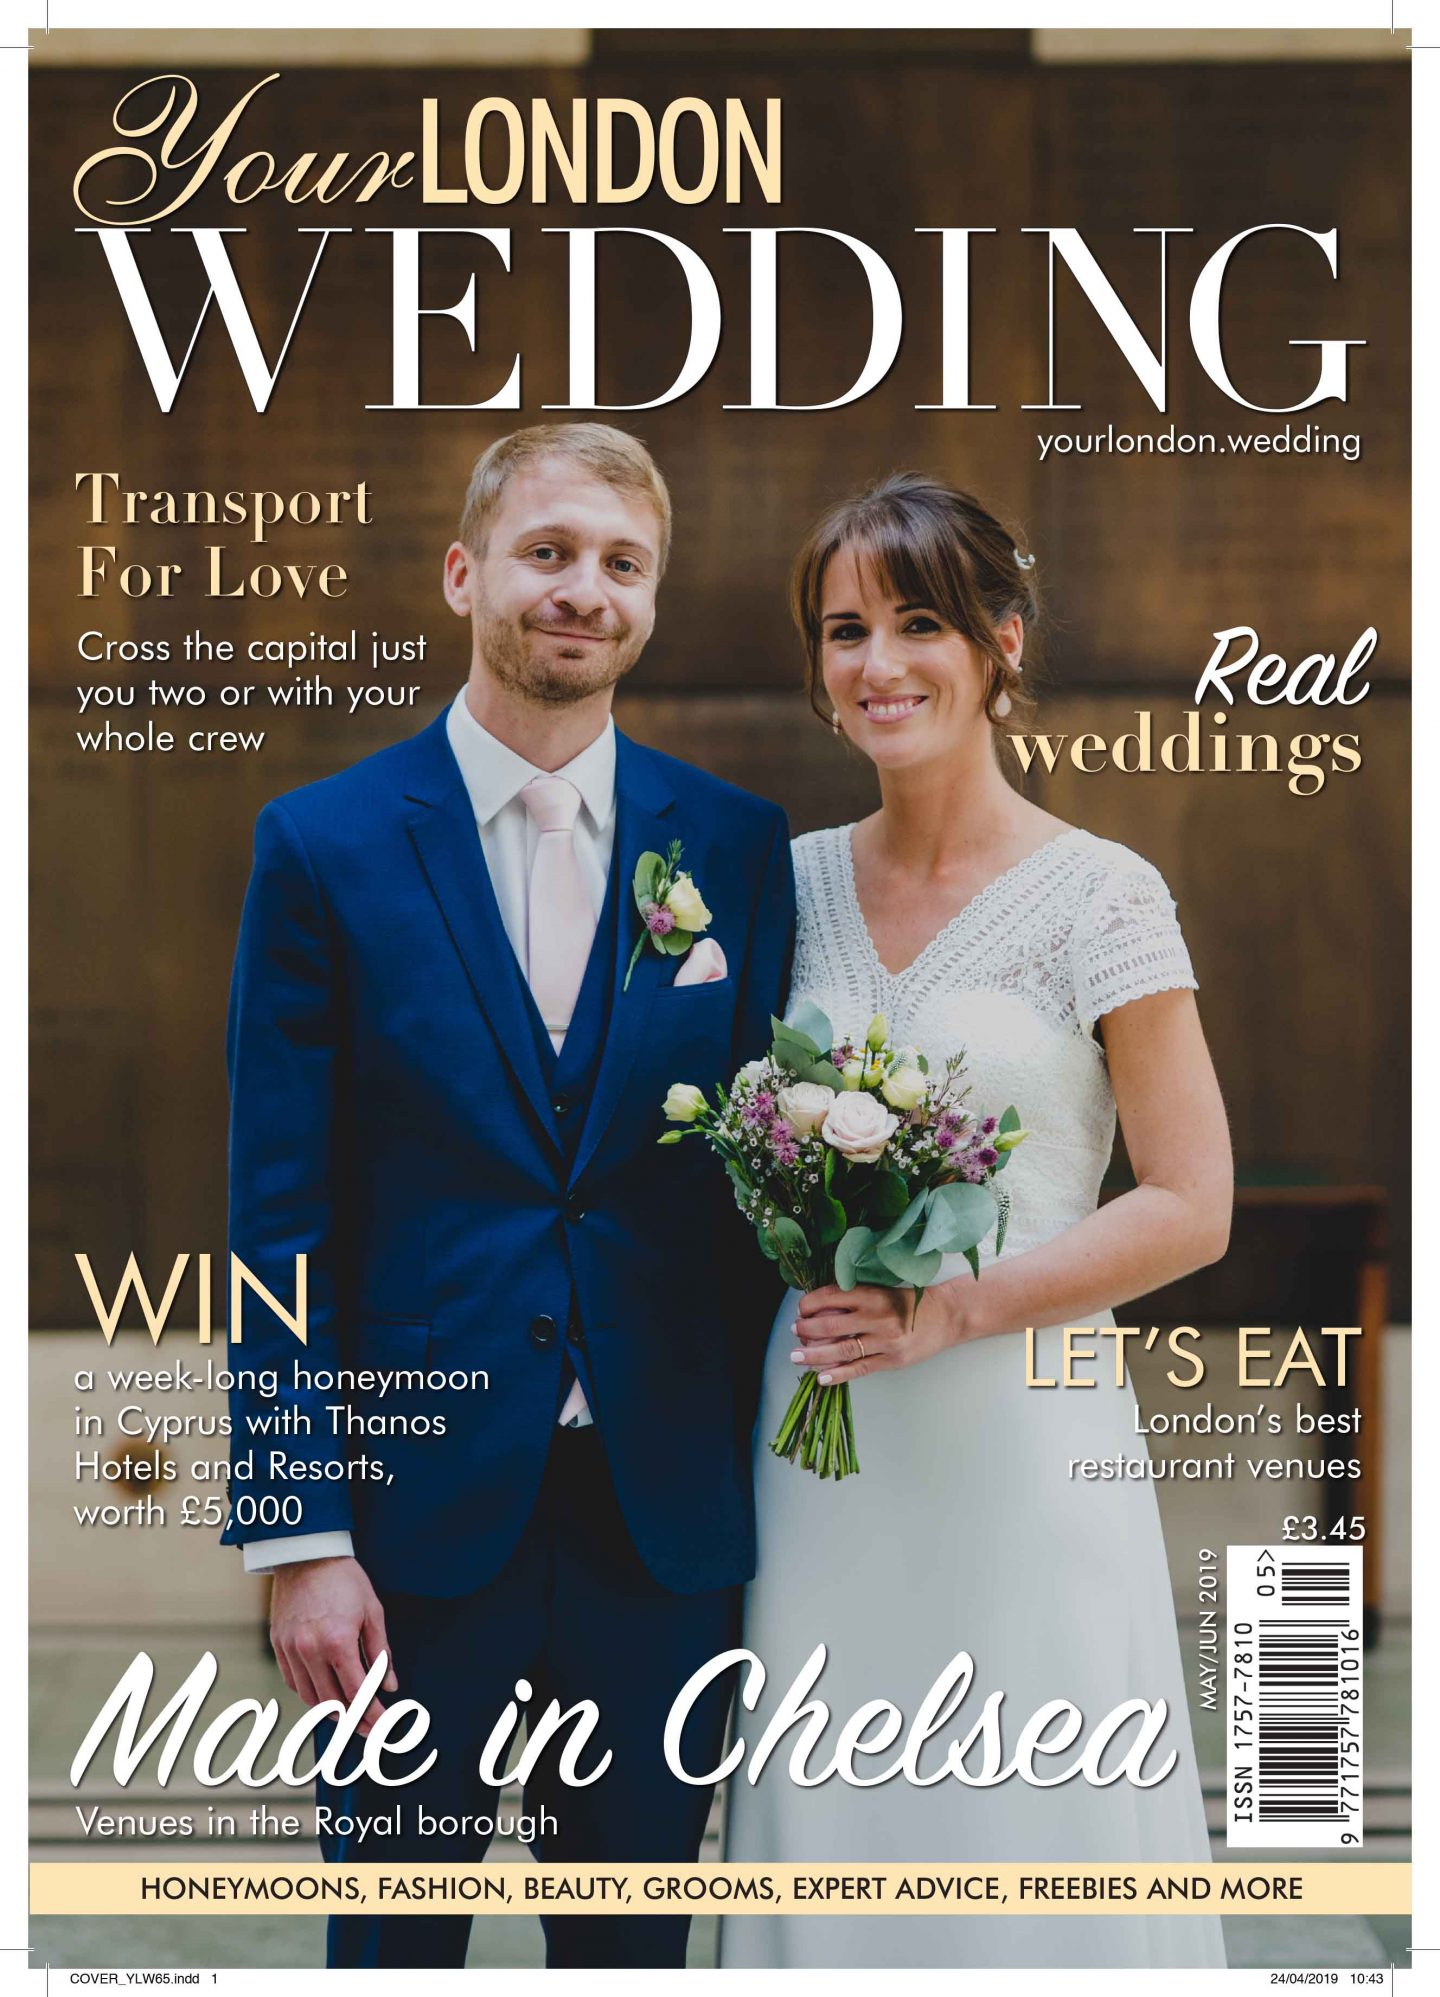 your-london-wedding-devine-bride-real-wedding-west-reservoir-centre-hackney-town-hall